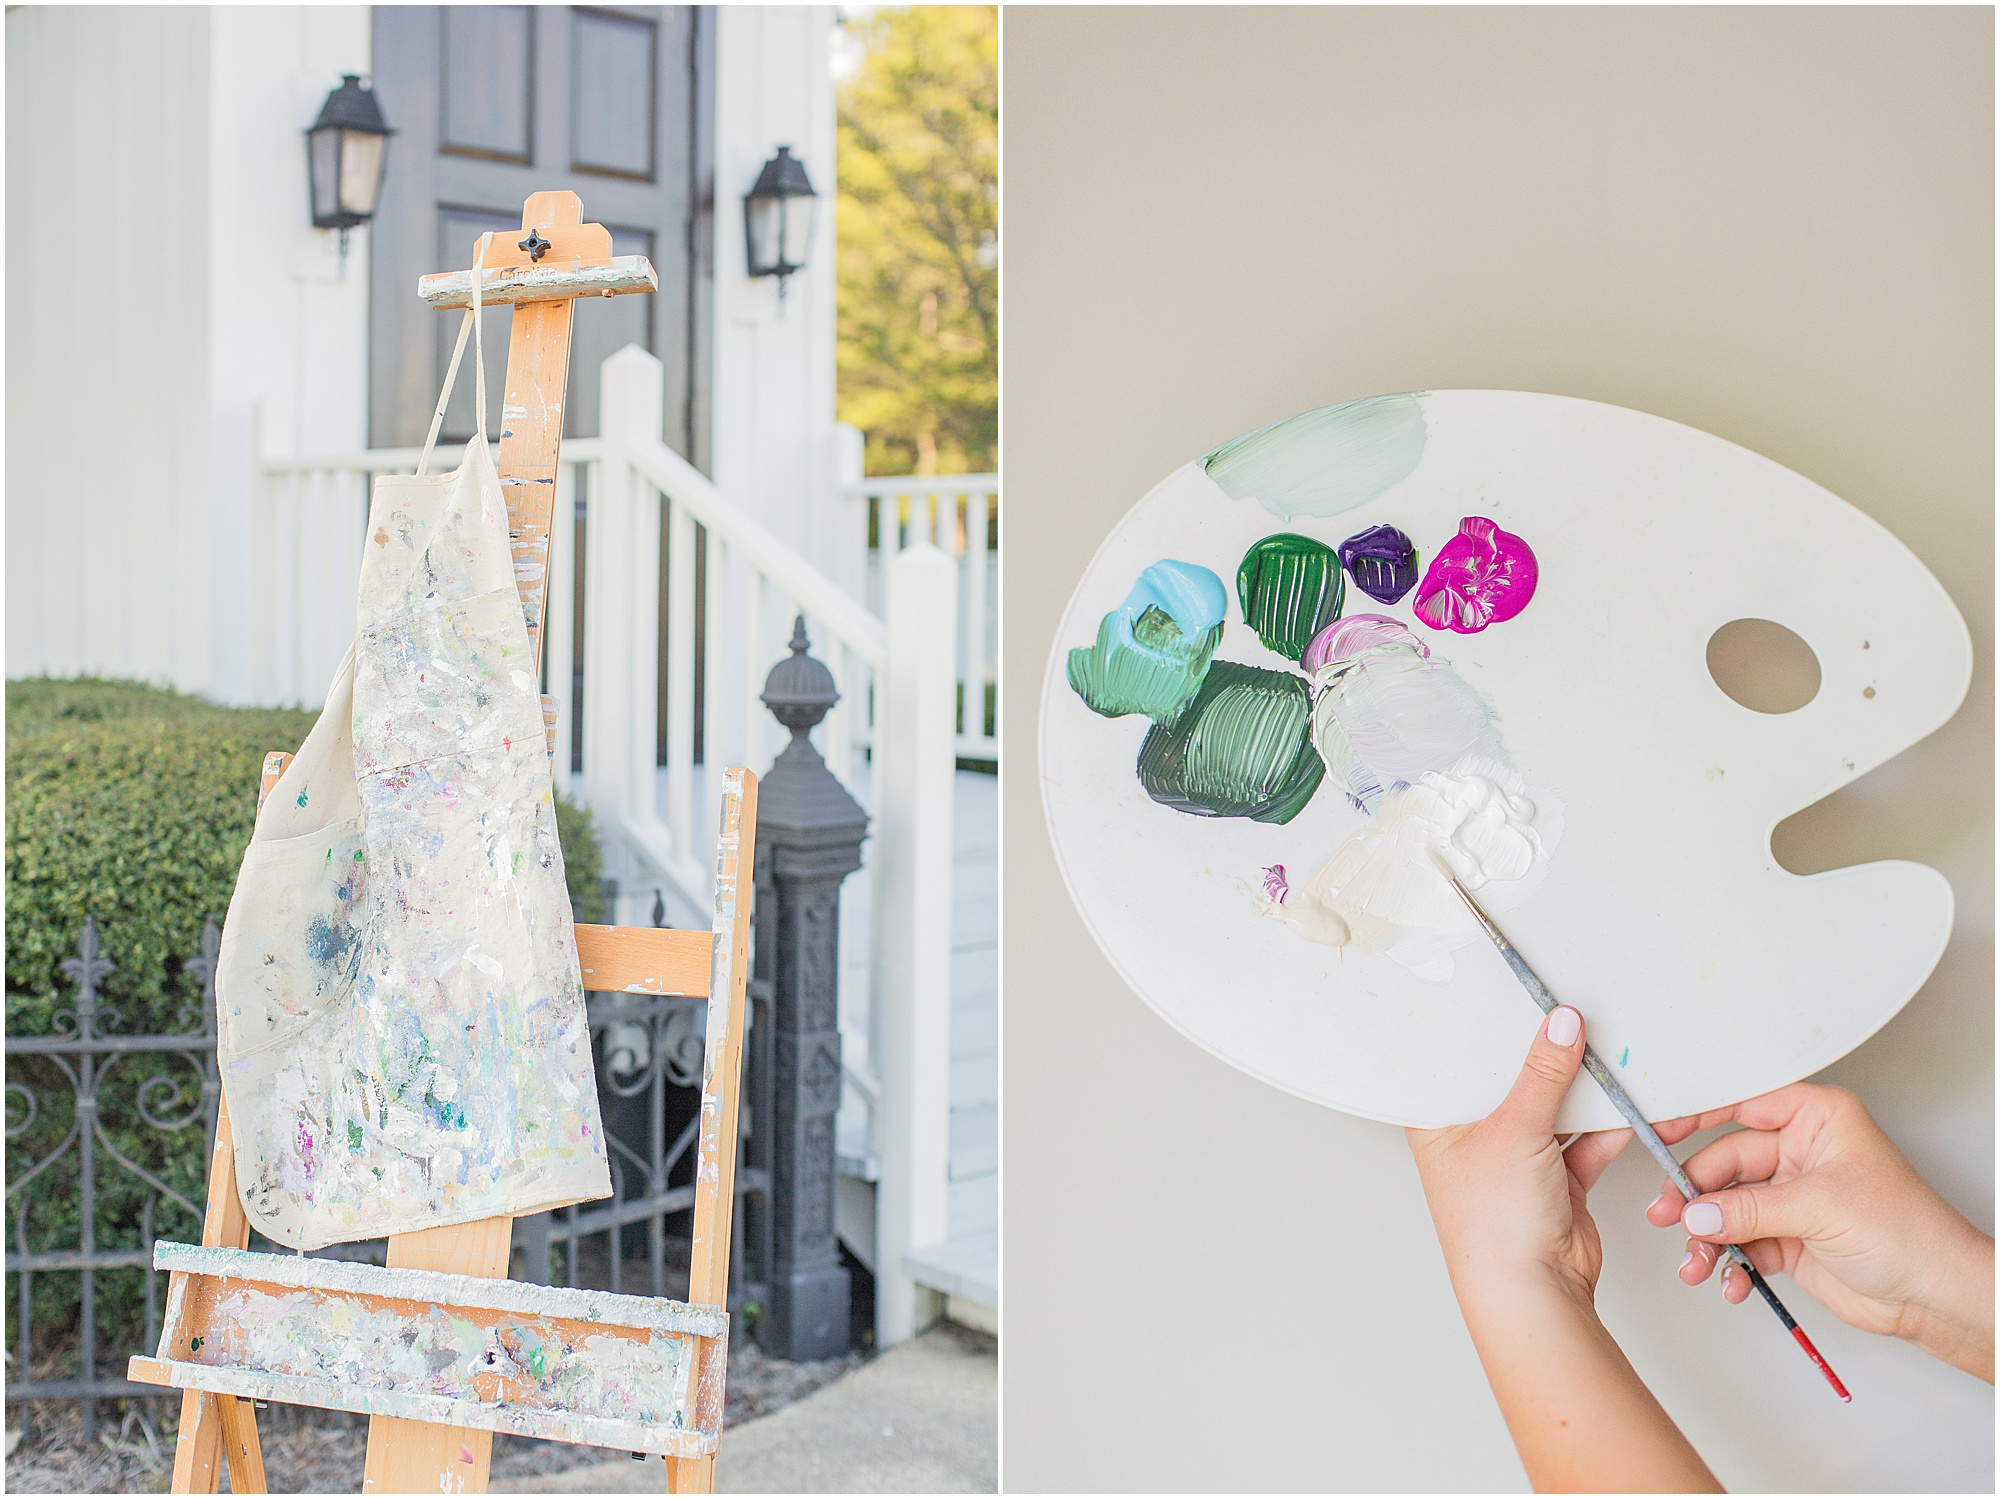 miriam-shufelt-art-mississippi-live-wedding-painter_0015.jpg